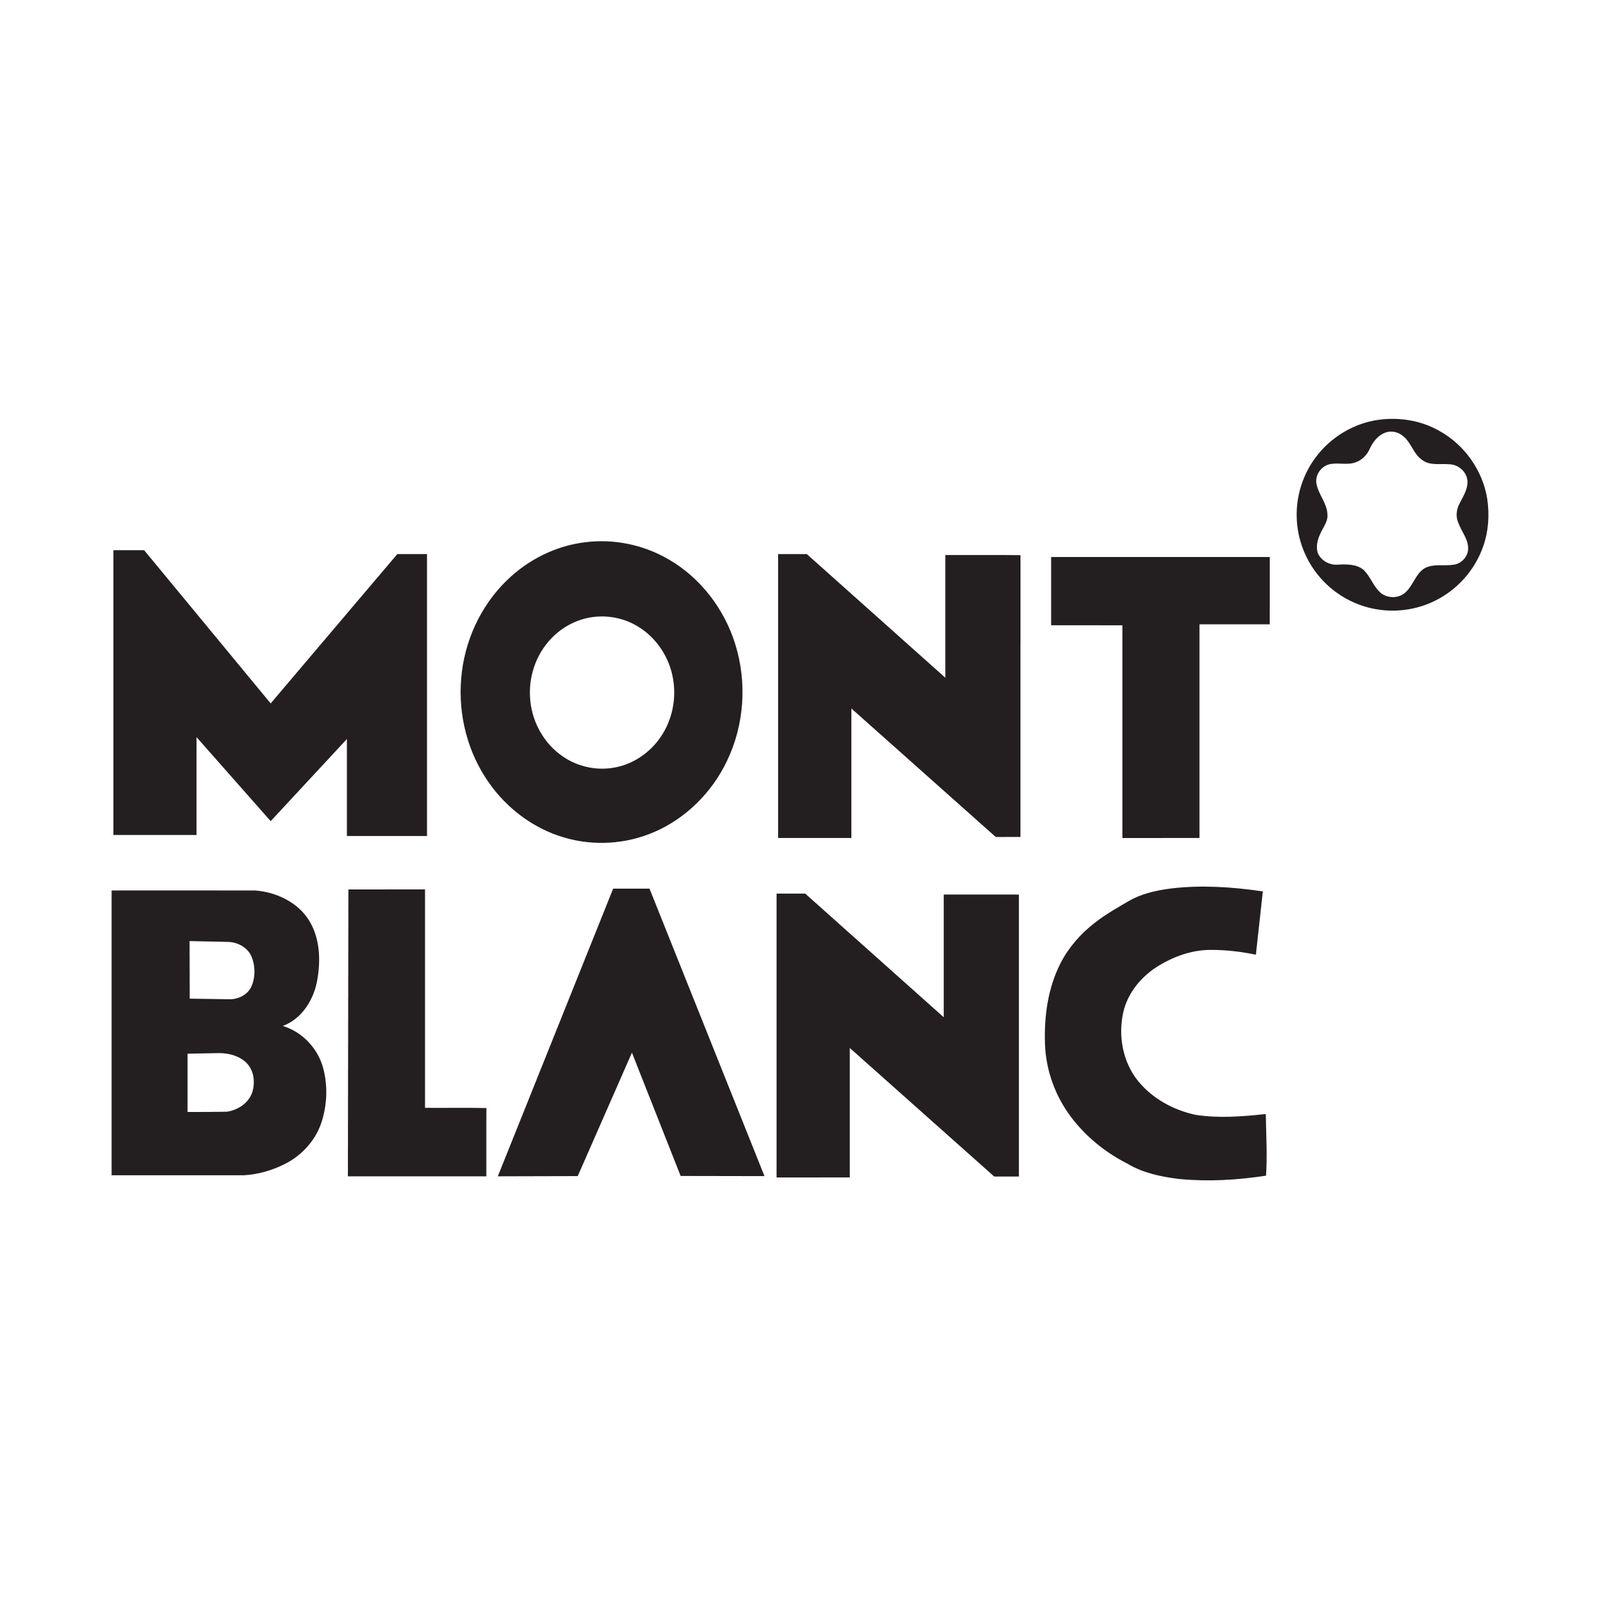 MONTBLANC (Image 1)